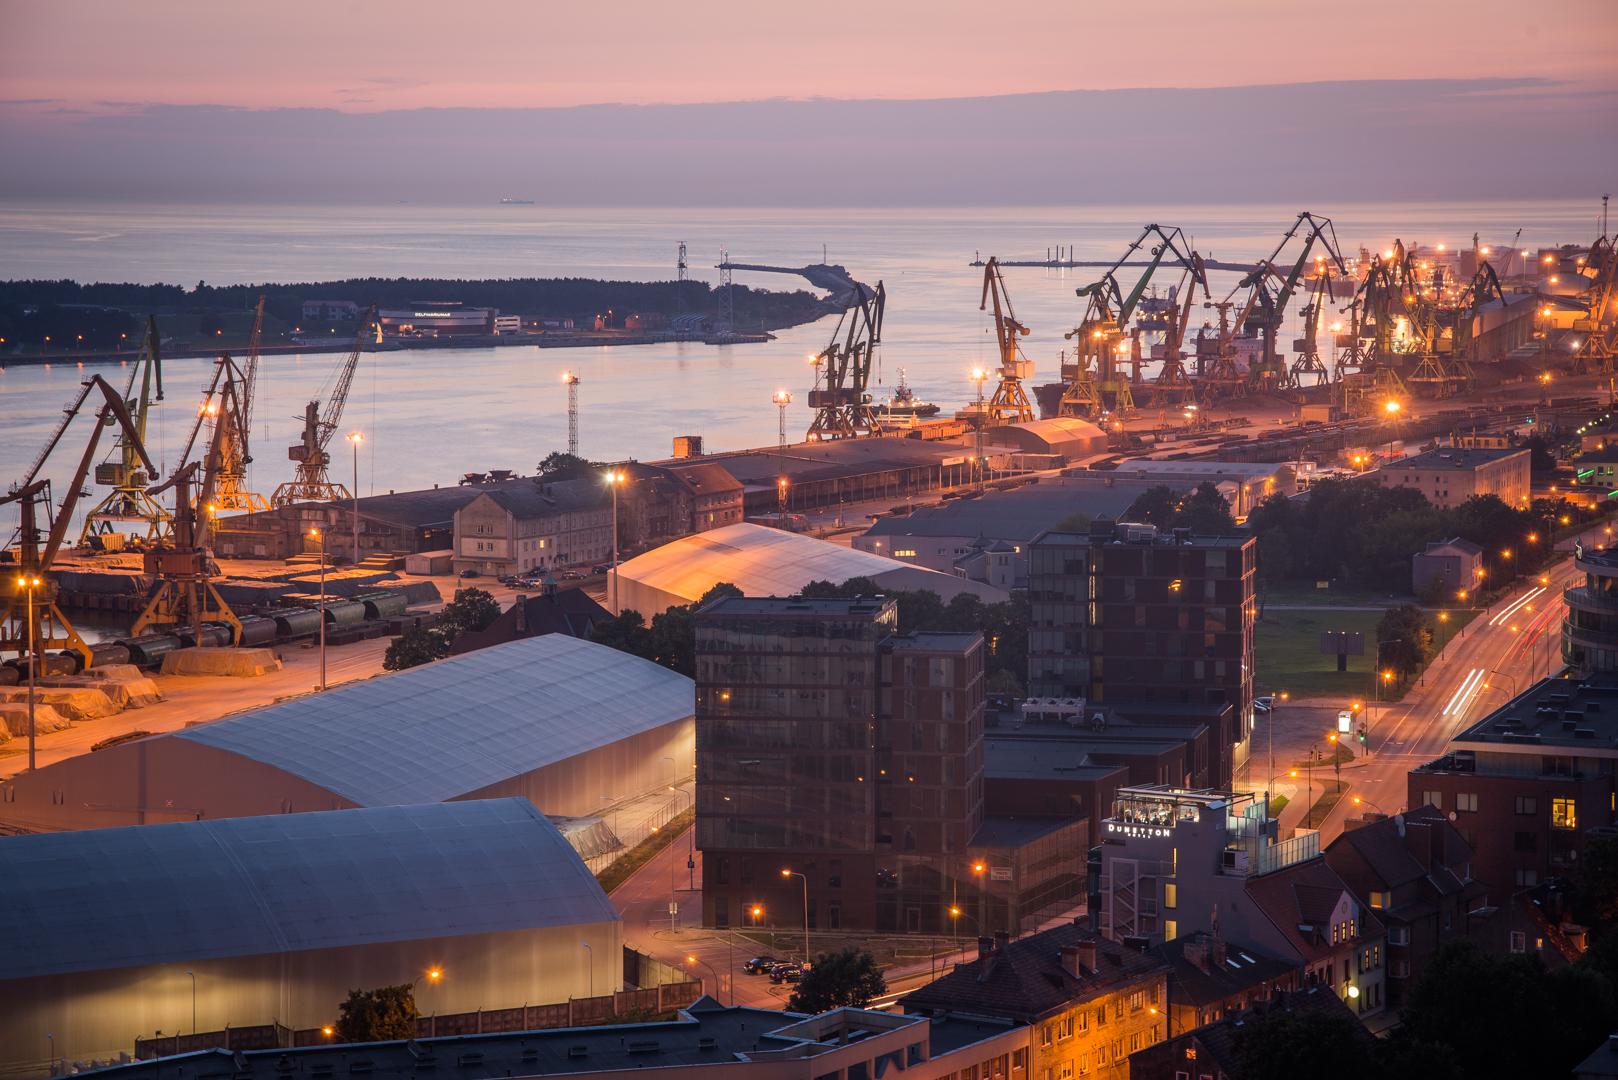 The_port_of_Klaip-ùda